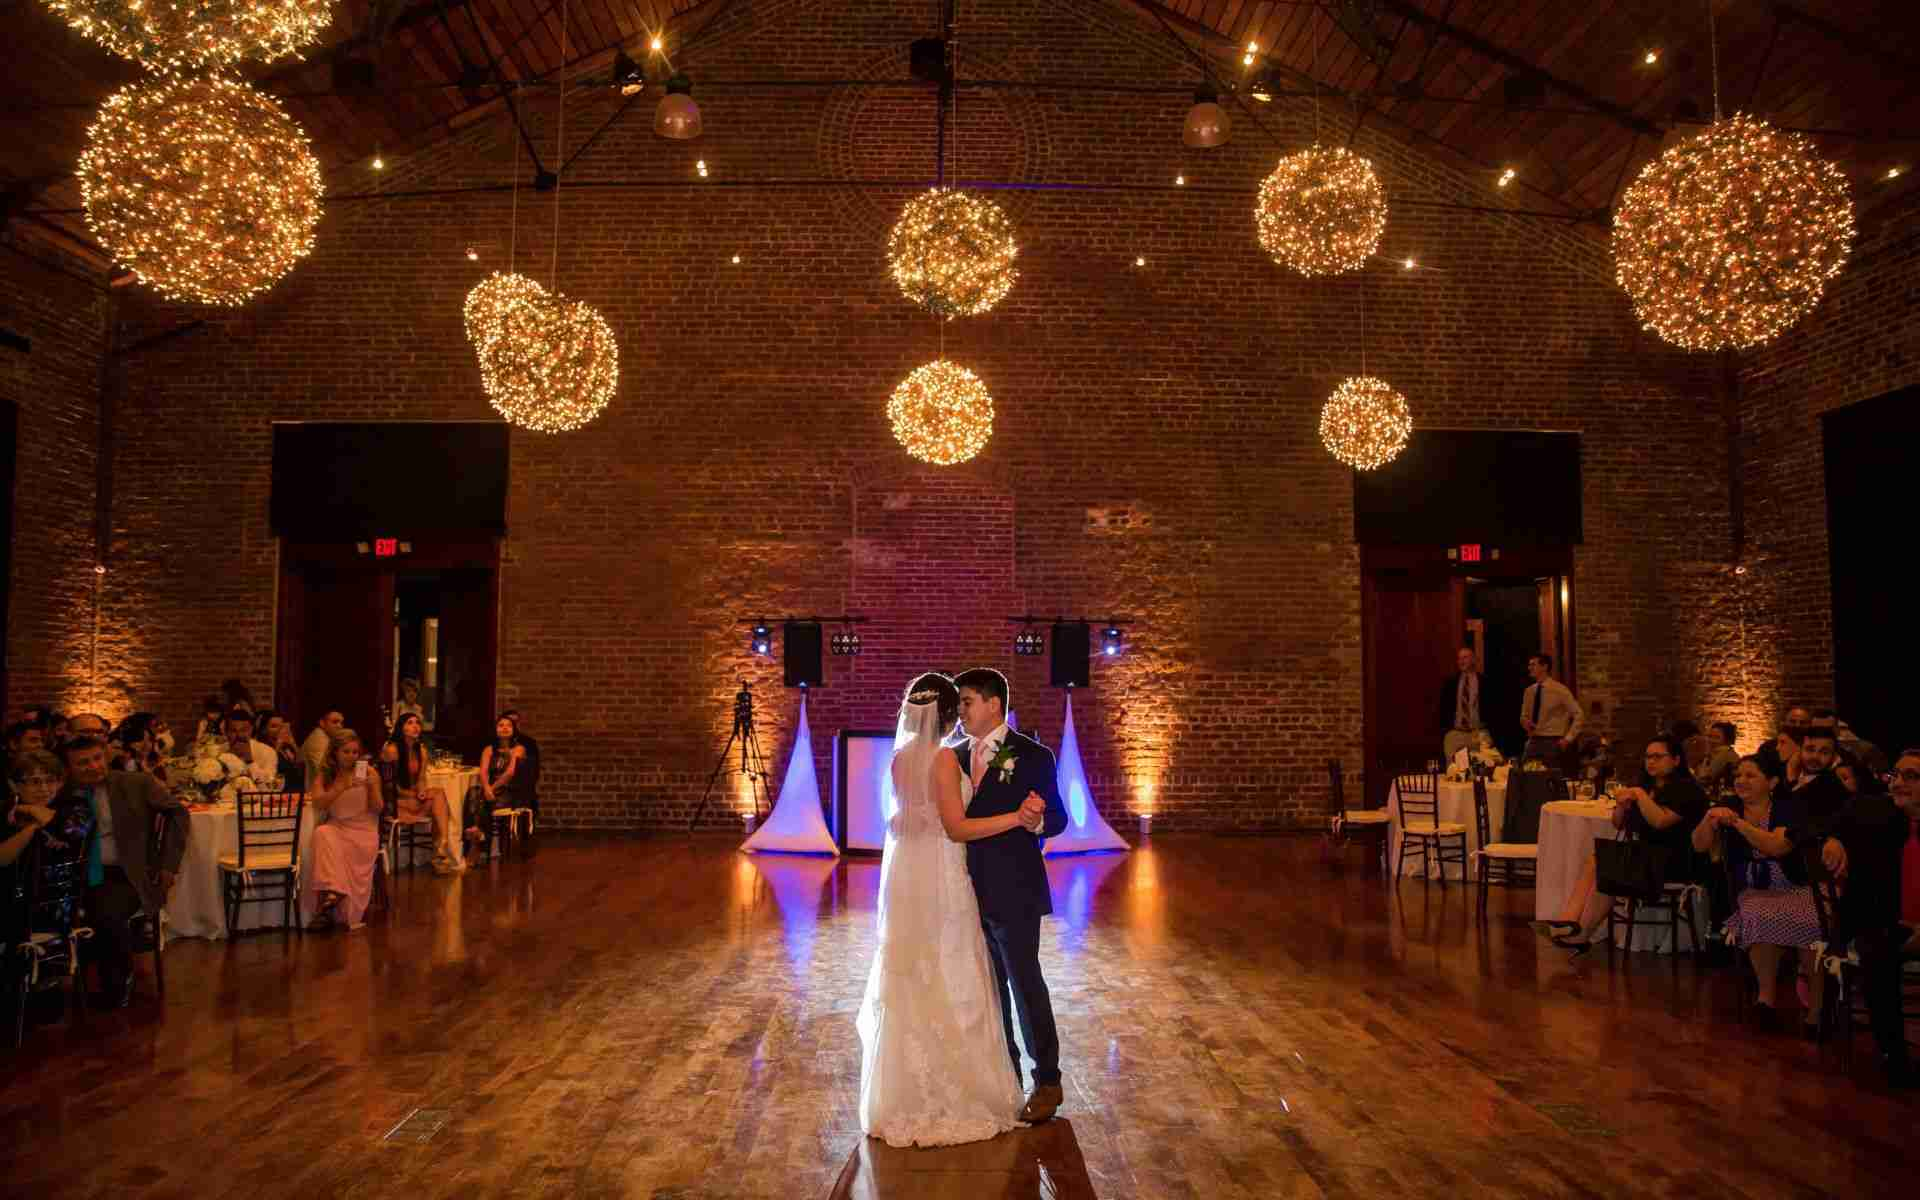 Latin Bride and Groom, First Dance, Charles Morris Center, Savannah, GA